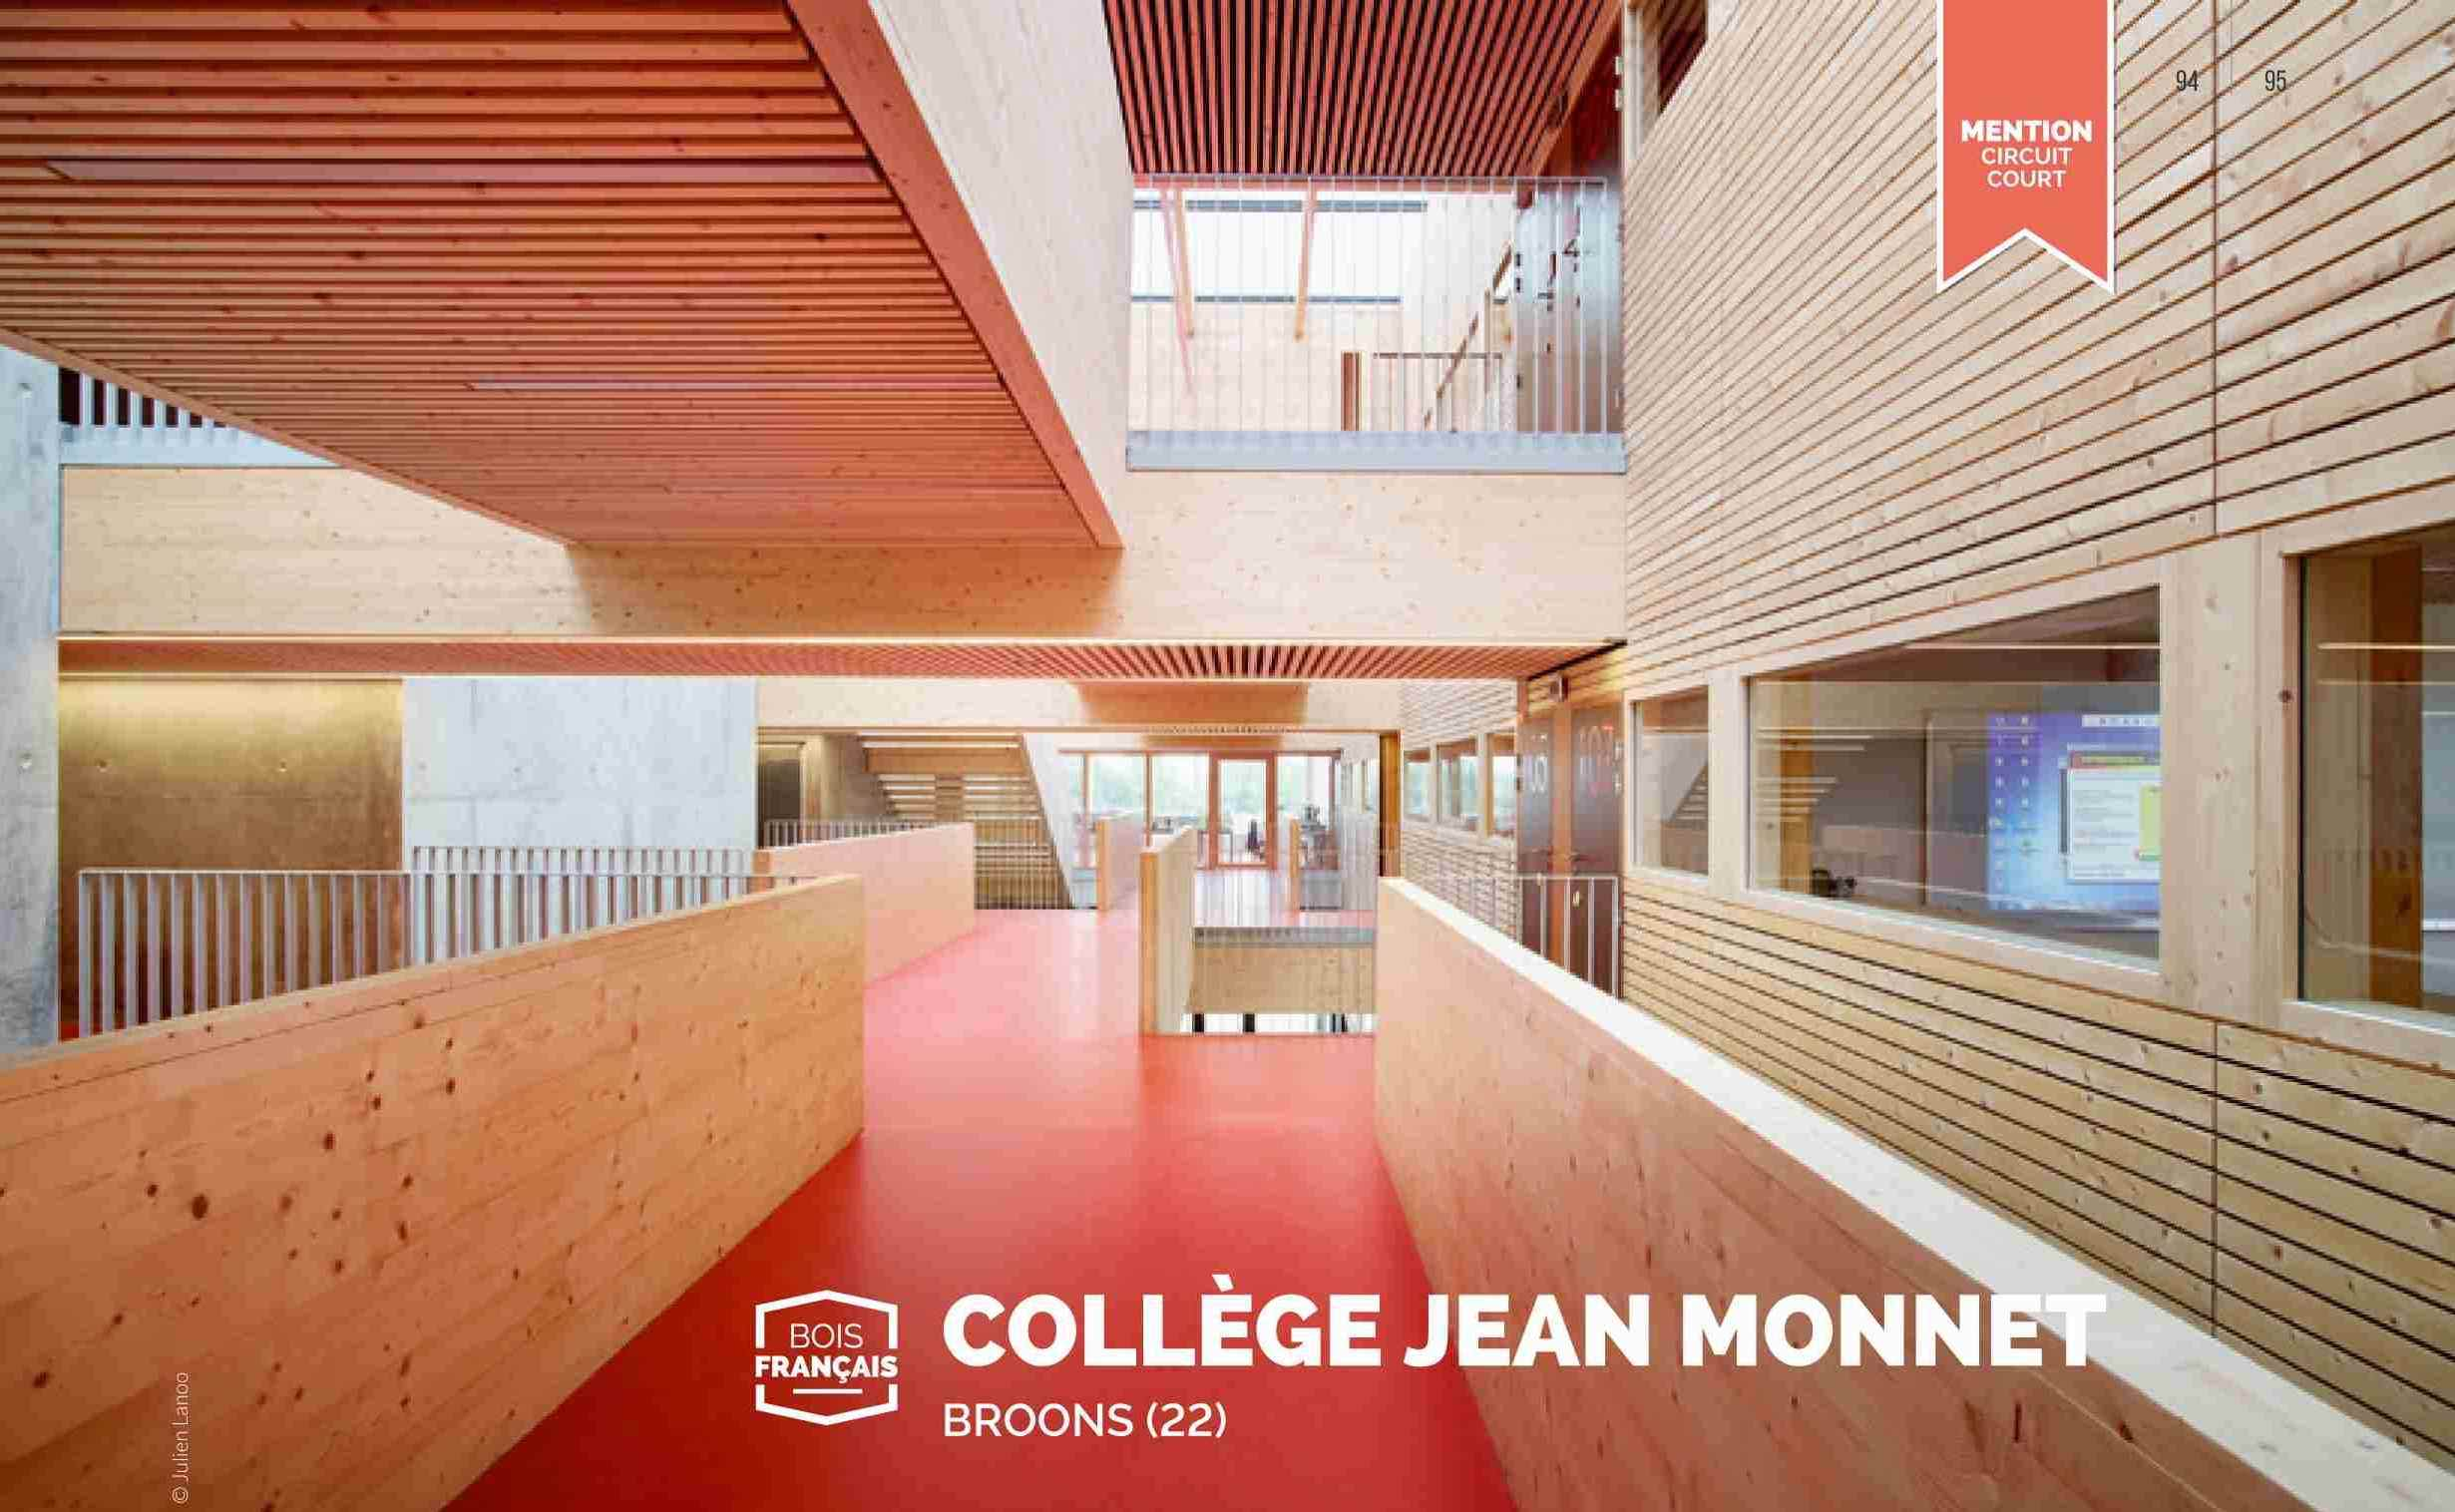 Collège Jean Monnet, BROONS